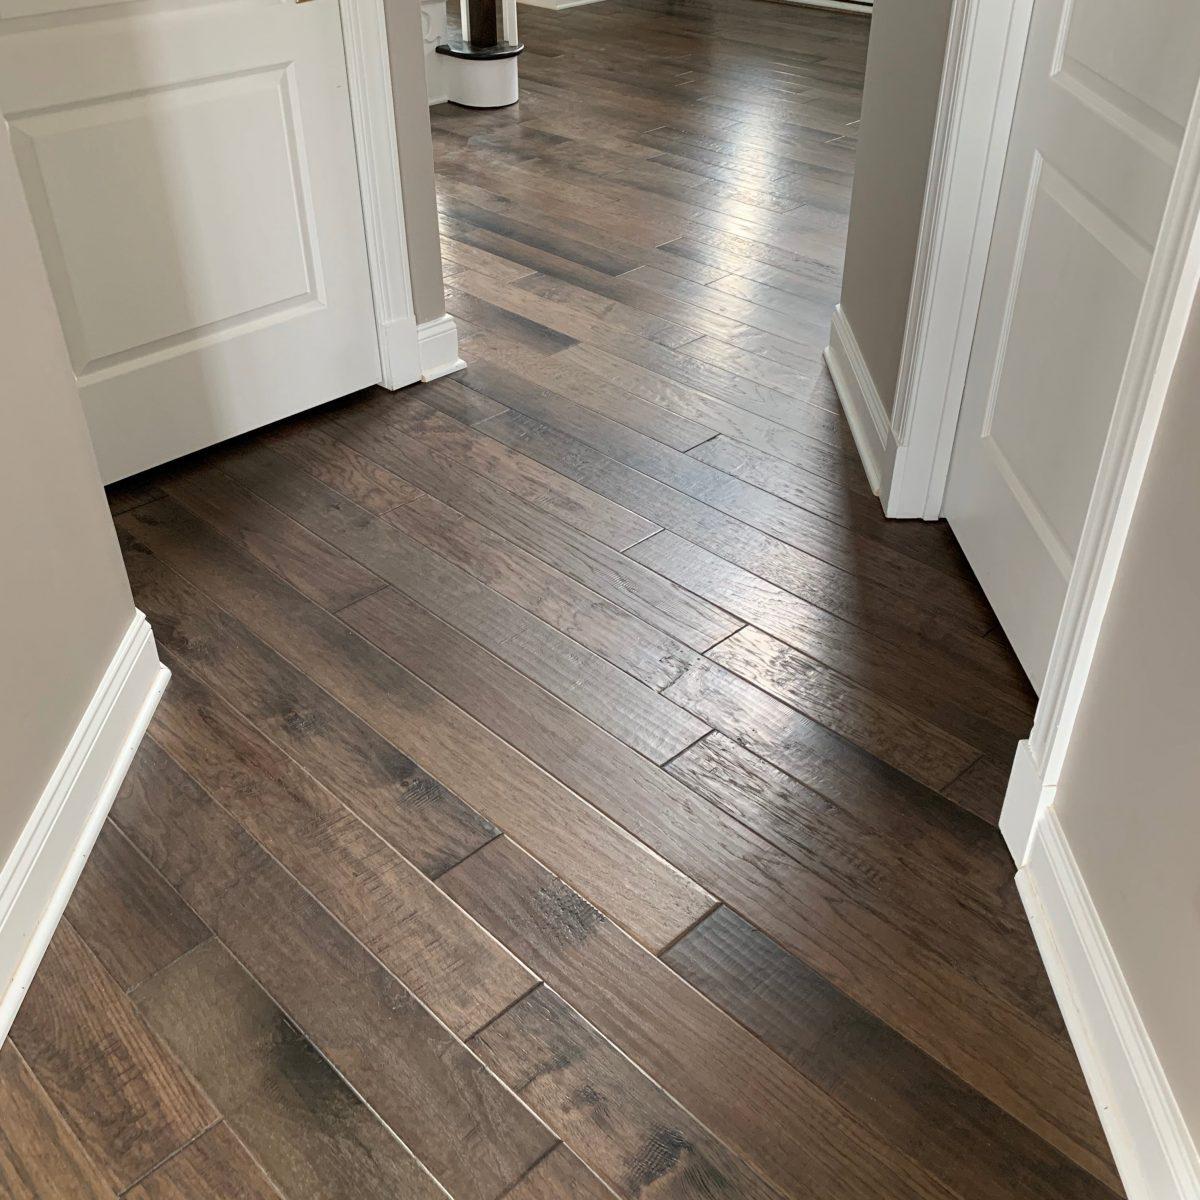 Bernina Hickory installed in the hallway